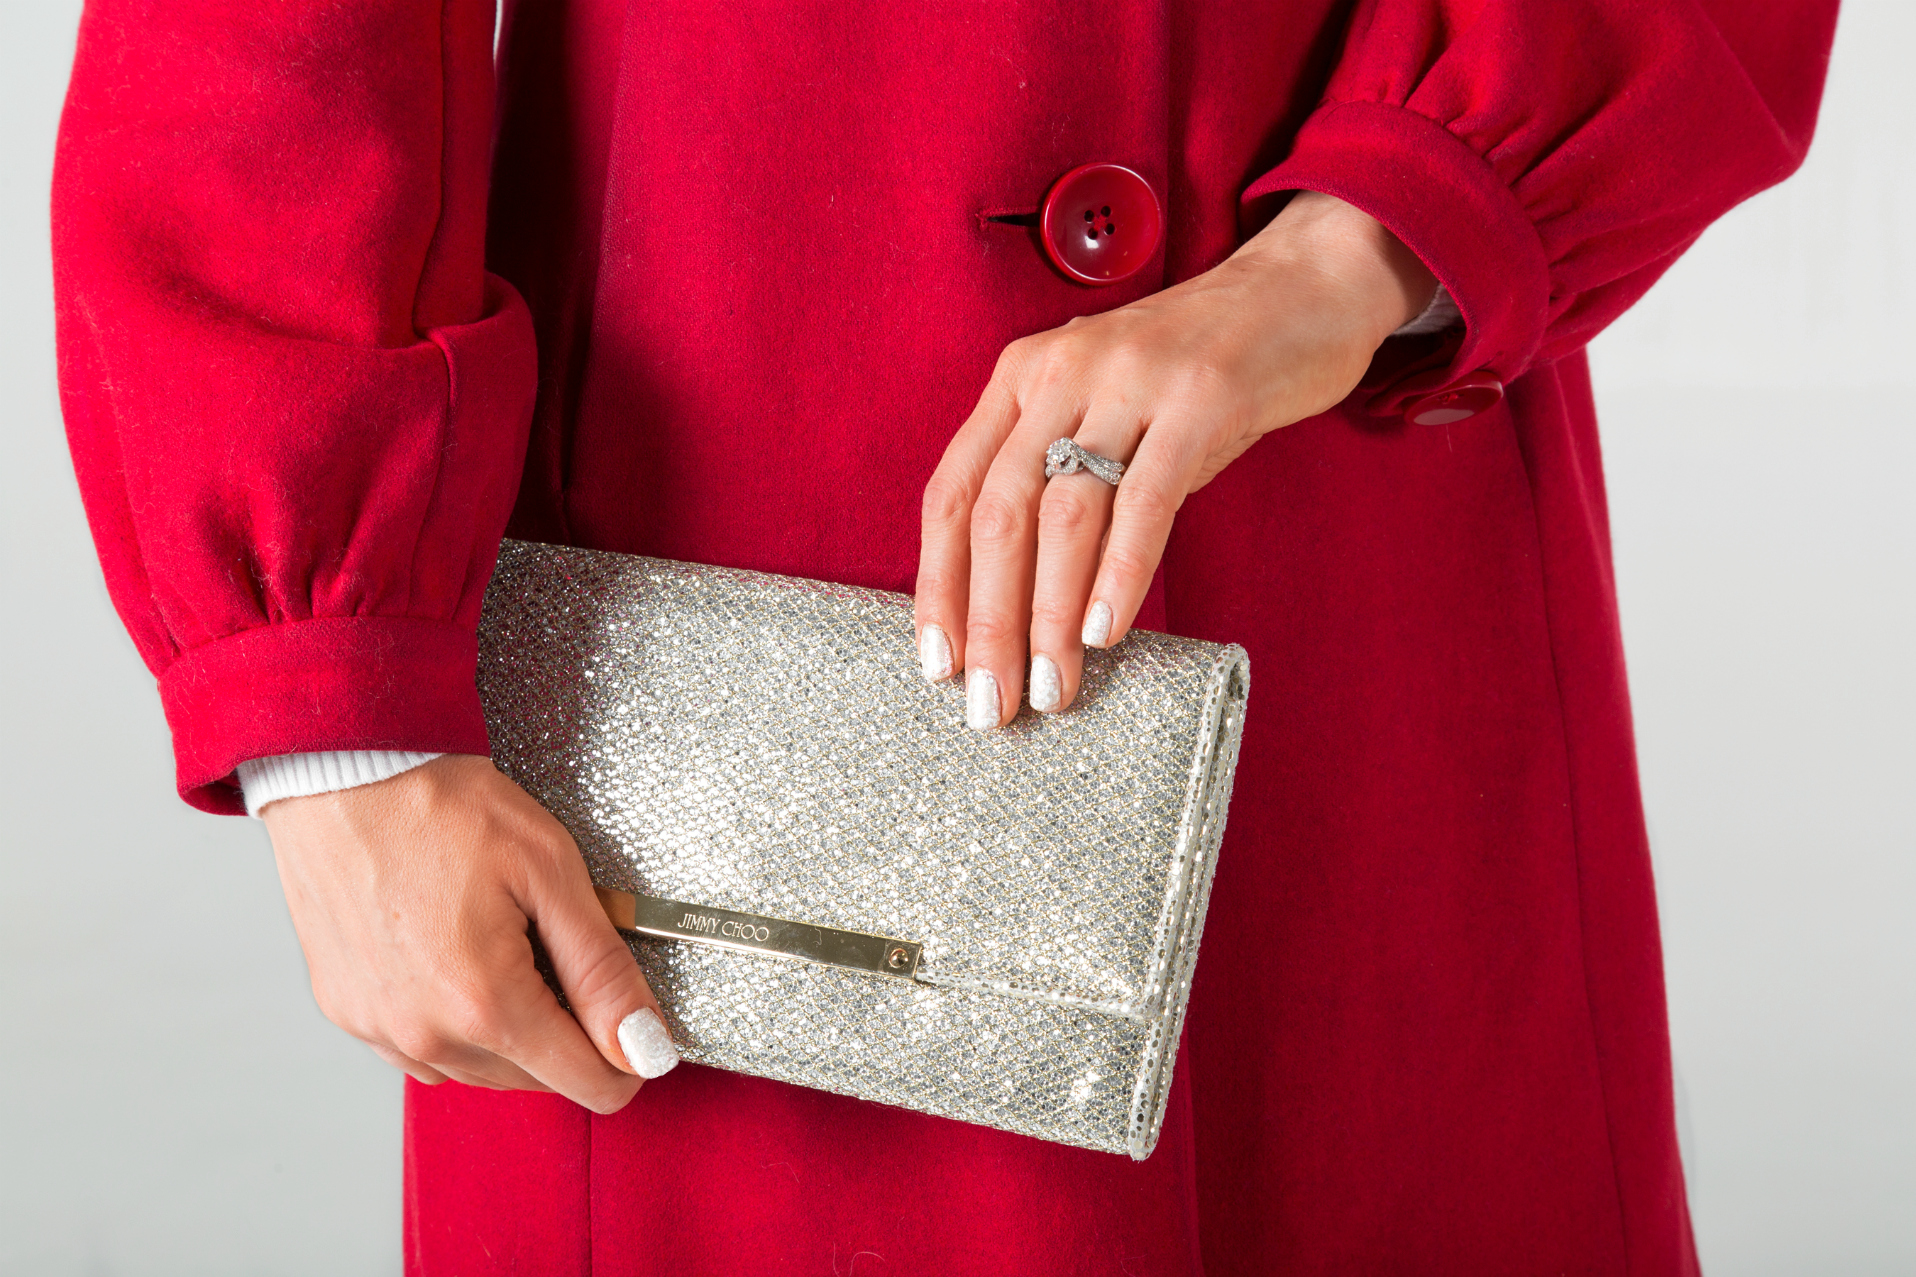 Jimmy Choo champagne glitter Marilyn clutch